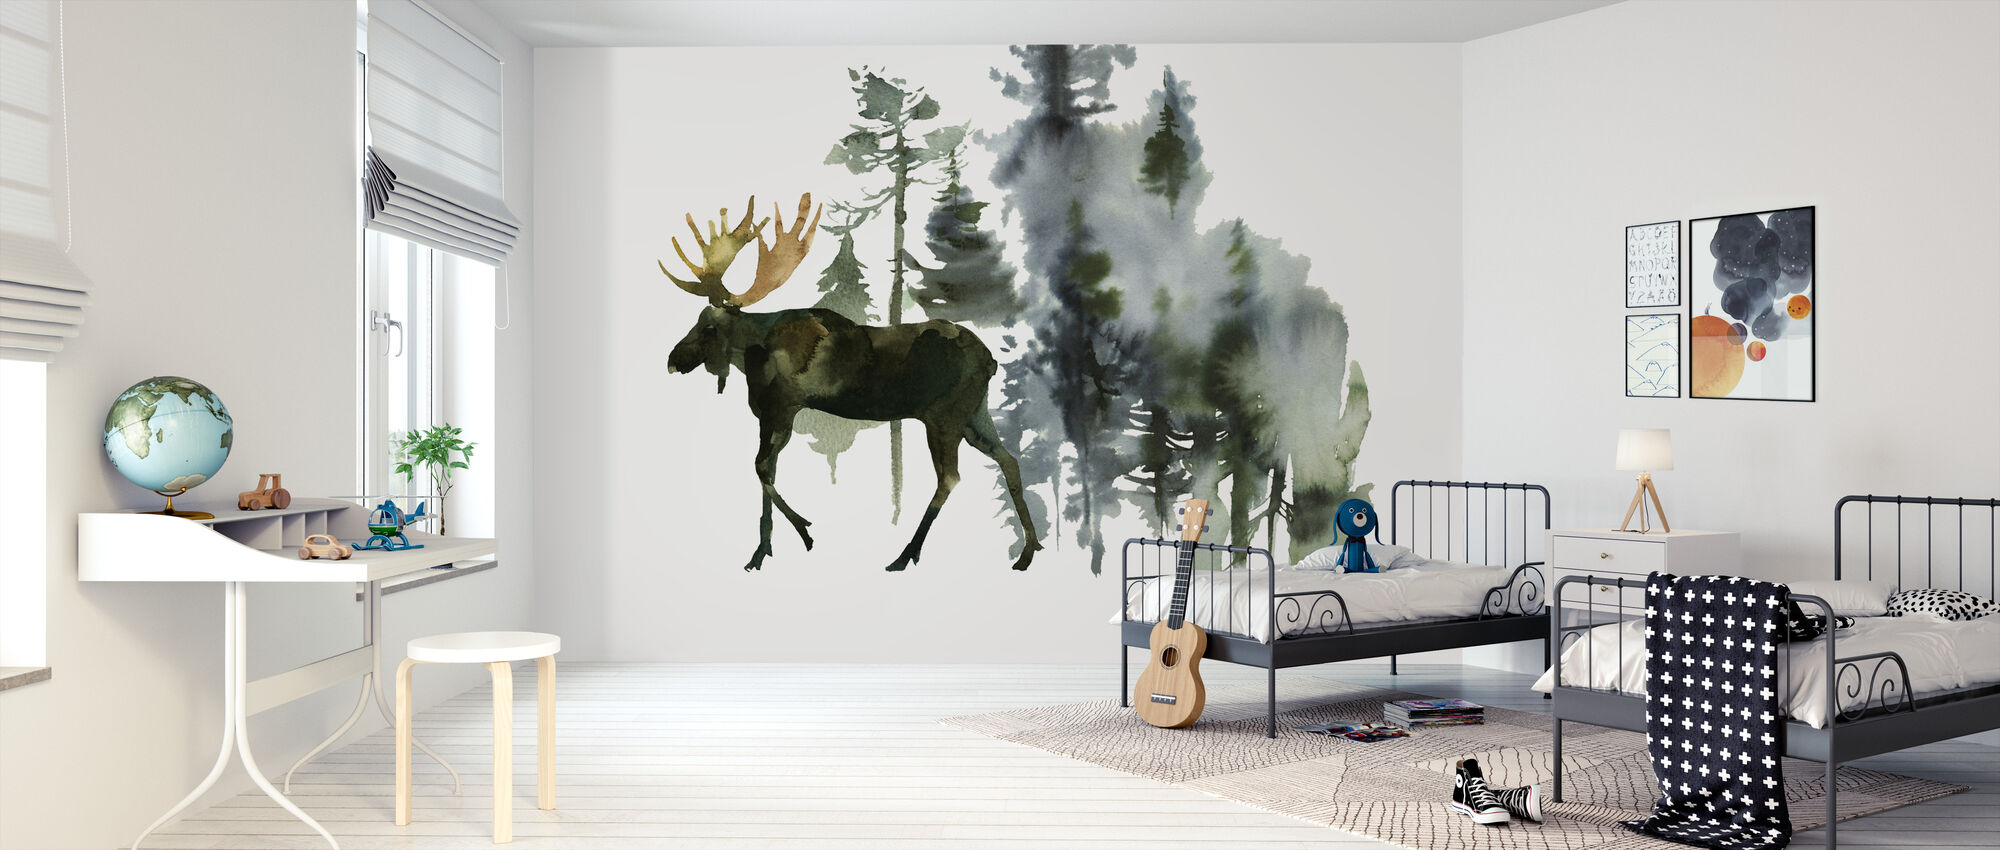 Watercolor Elk in Forest - Wallpaper - Kids Room